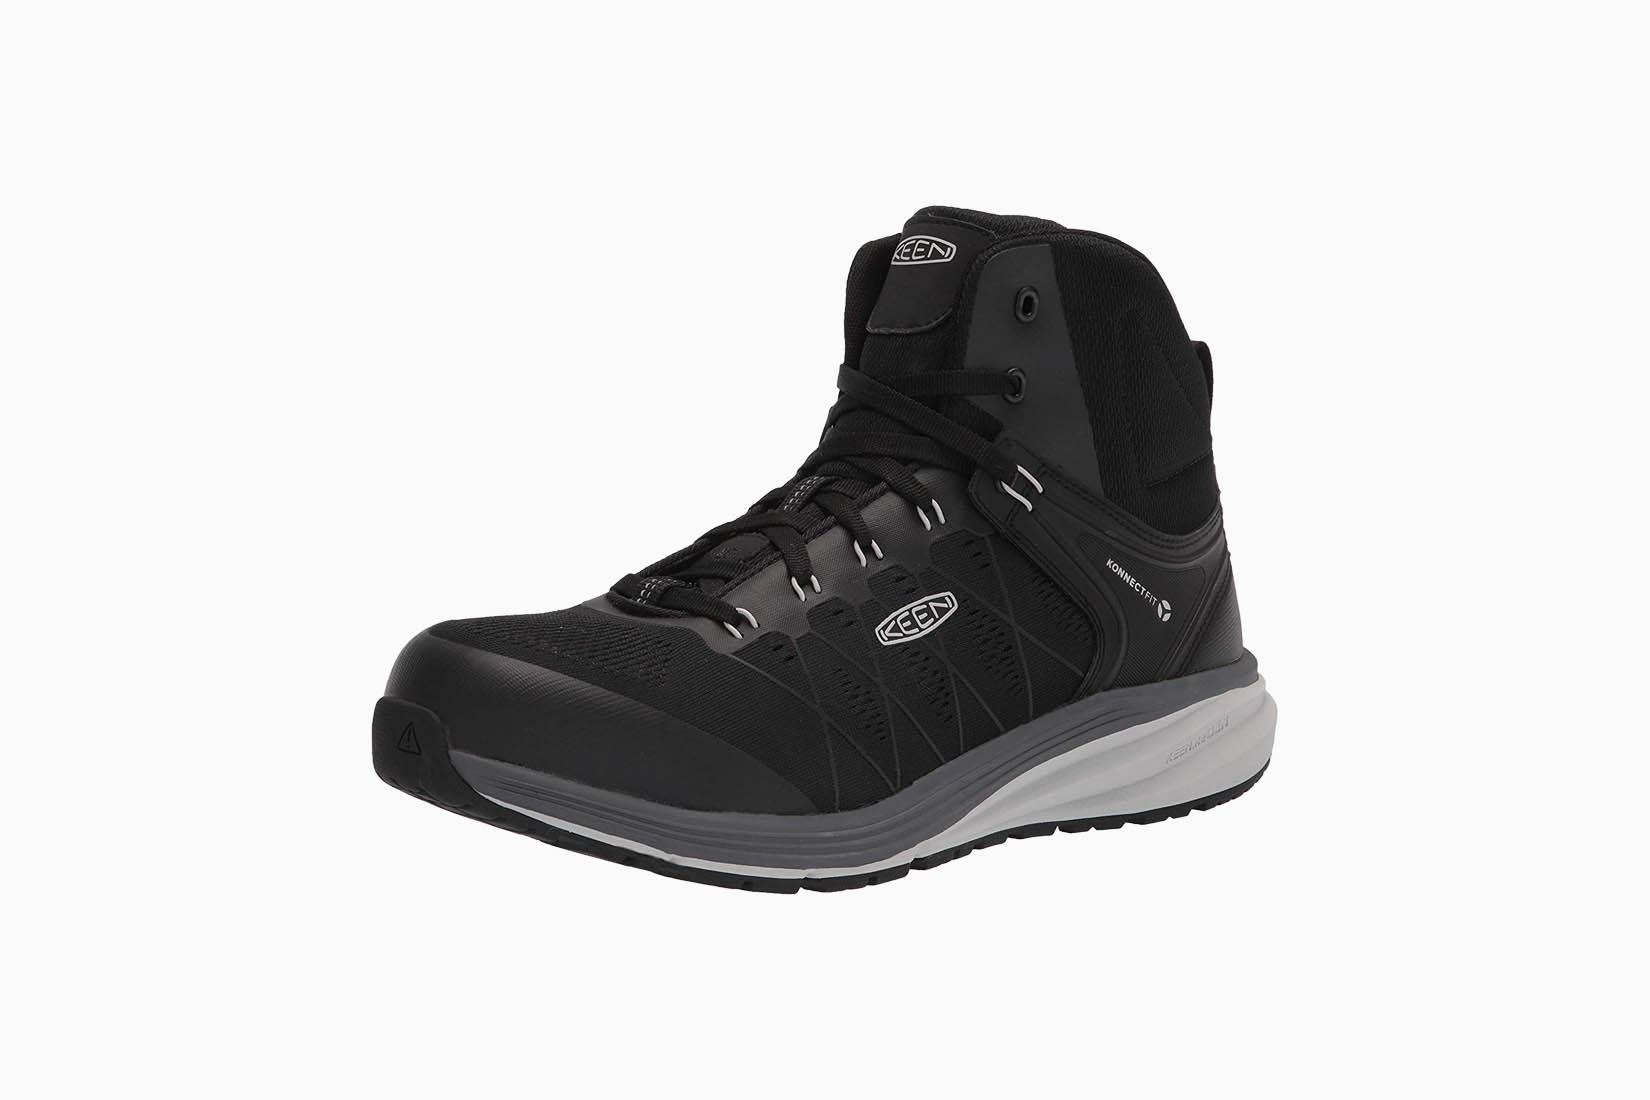 best work boots men keen review Luxe Digital